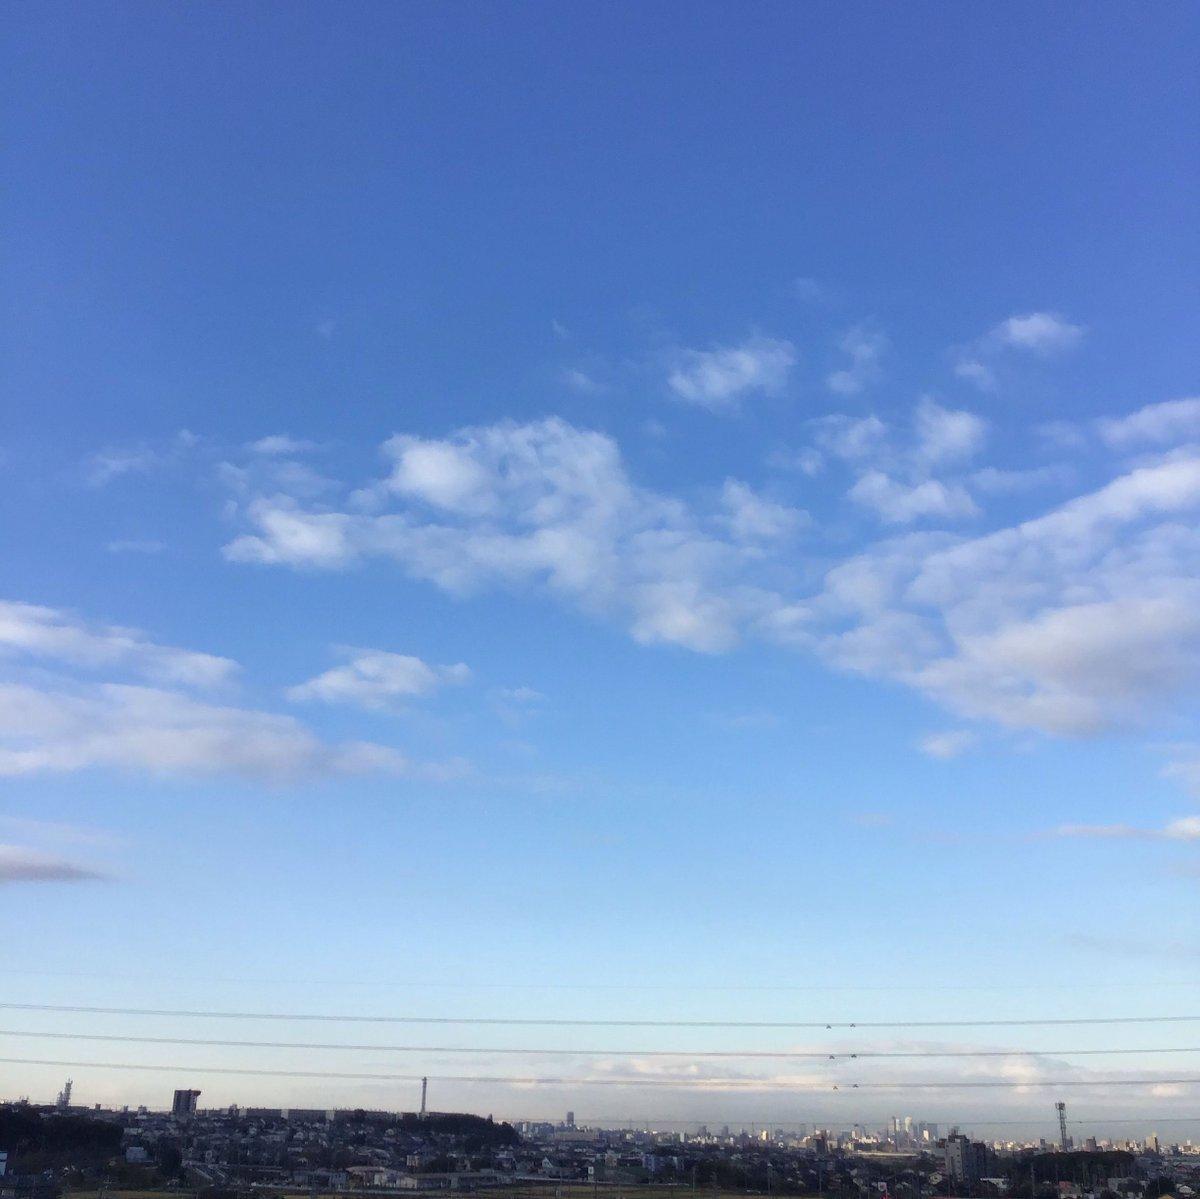 test ツイッターメディア - おはようございます(^ ^) 12月4日(水)尾張旭市の天気予報は晴☀️ 最高気温…11℃(-1℃) 最低気温…5℃ 紫外線指数…弱い 洗濯指数…室内に干すか乾燥機がお勧め 服装指数…コートを着ないと結構寒いかも  #なびぽ https://t.co/YanBQgiP3w  #ハザードマップ https://t.co/EWnvKX80fc https://t.co/u7tjfbpN2h